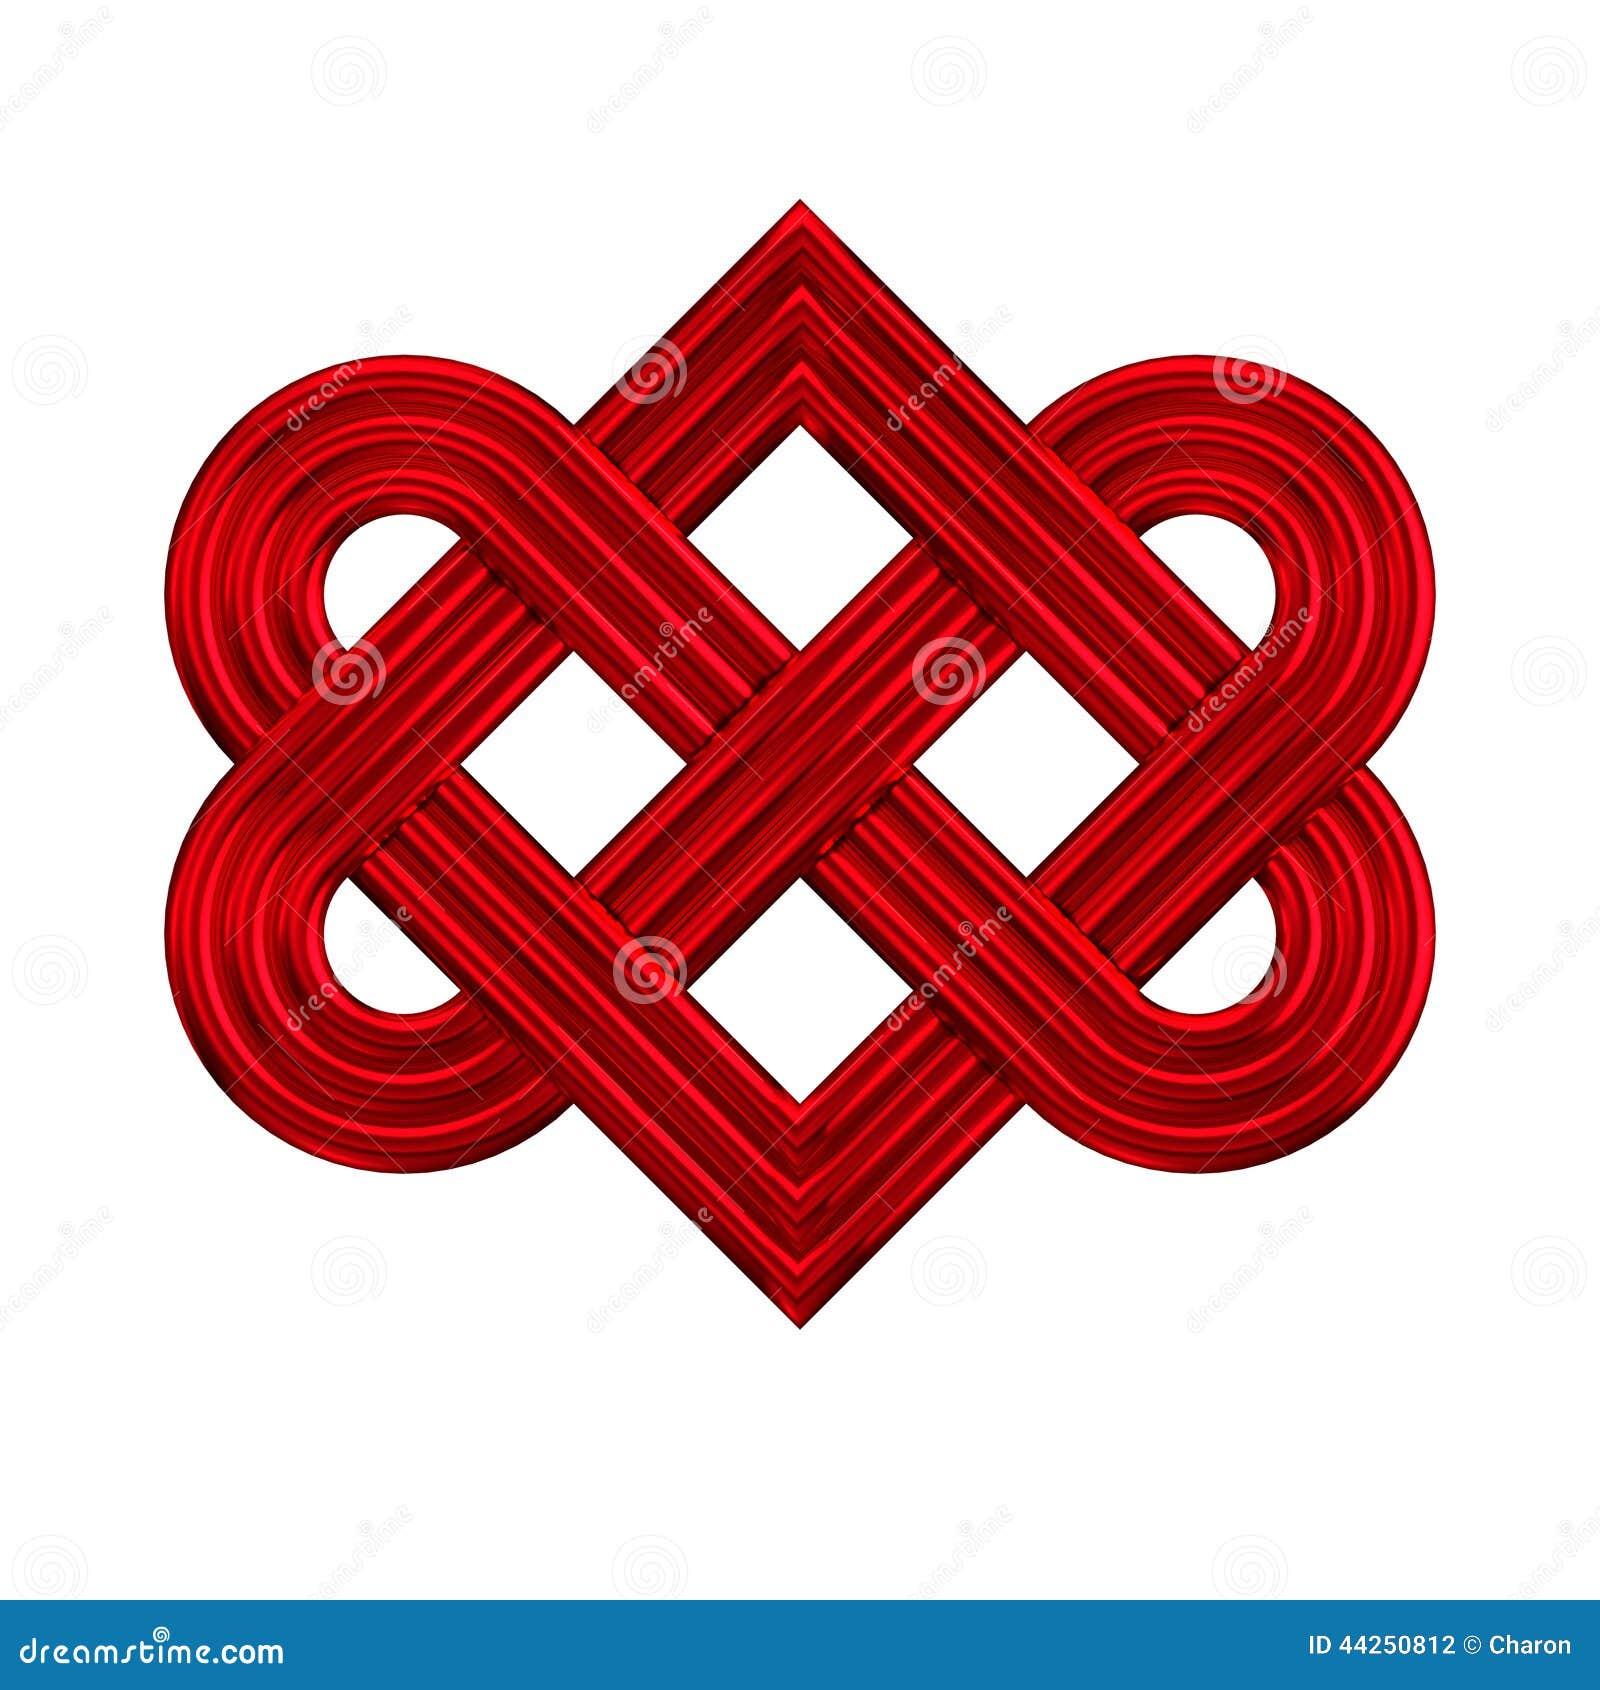 Interlocking heart knot symbol stock illustration illustration interlocking heart knot symbol biocorpaavc Images